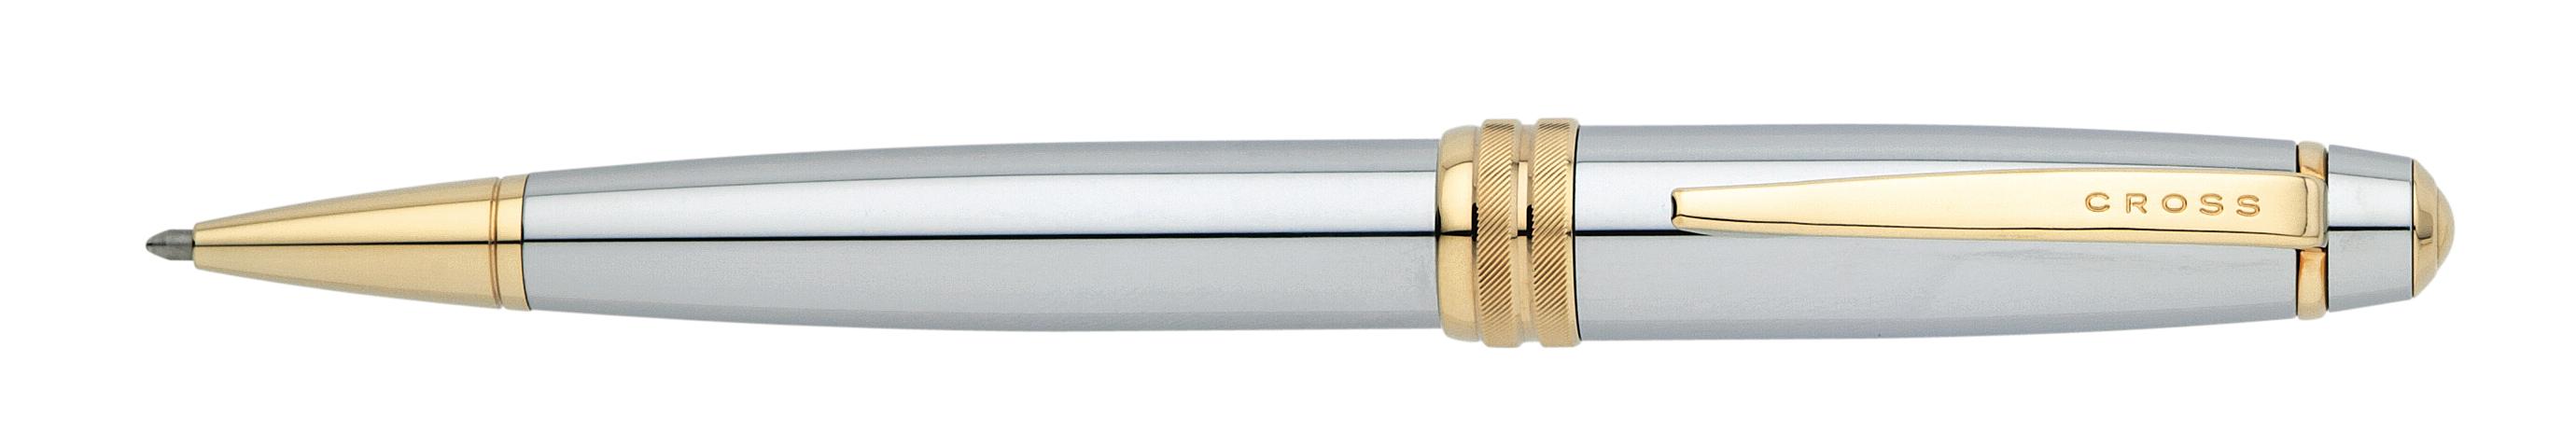 Bailey Medalist Ballpoint Pen